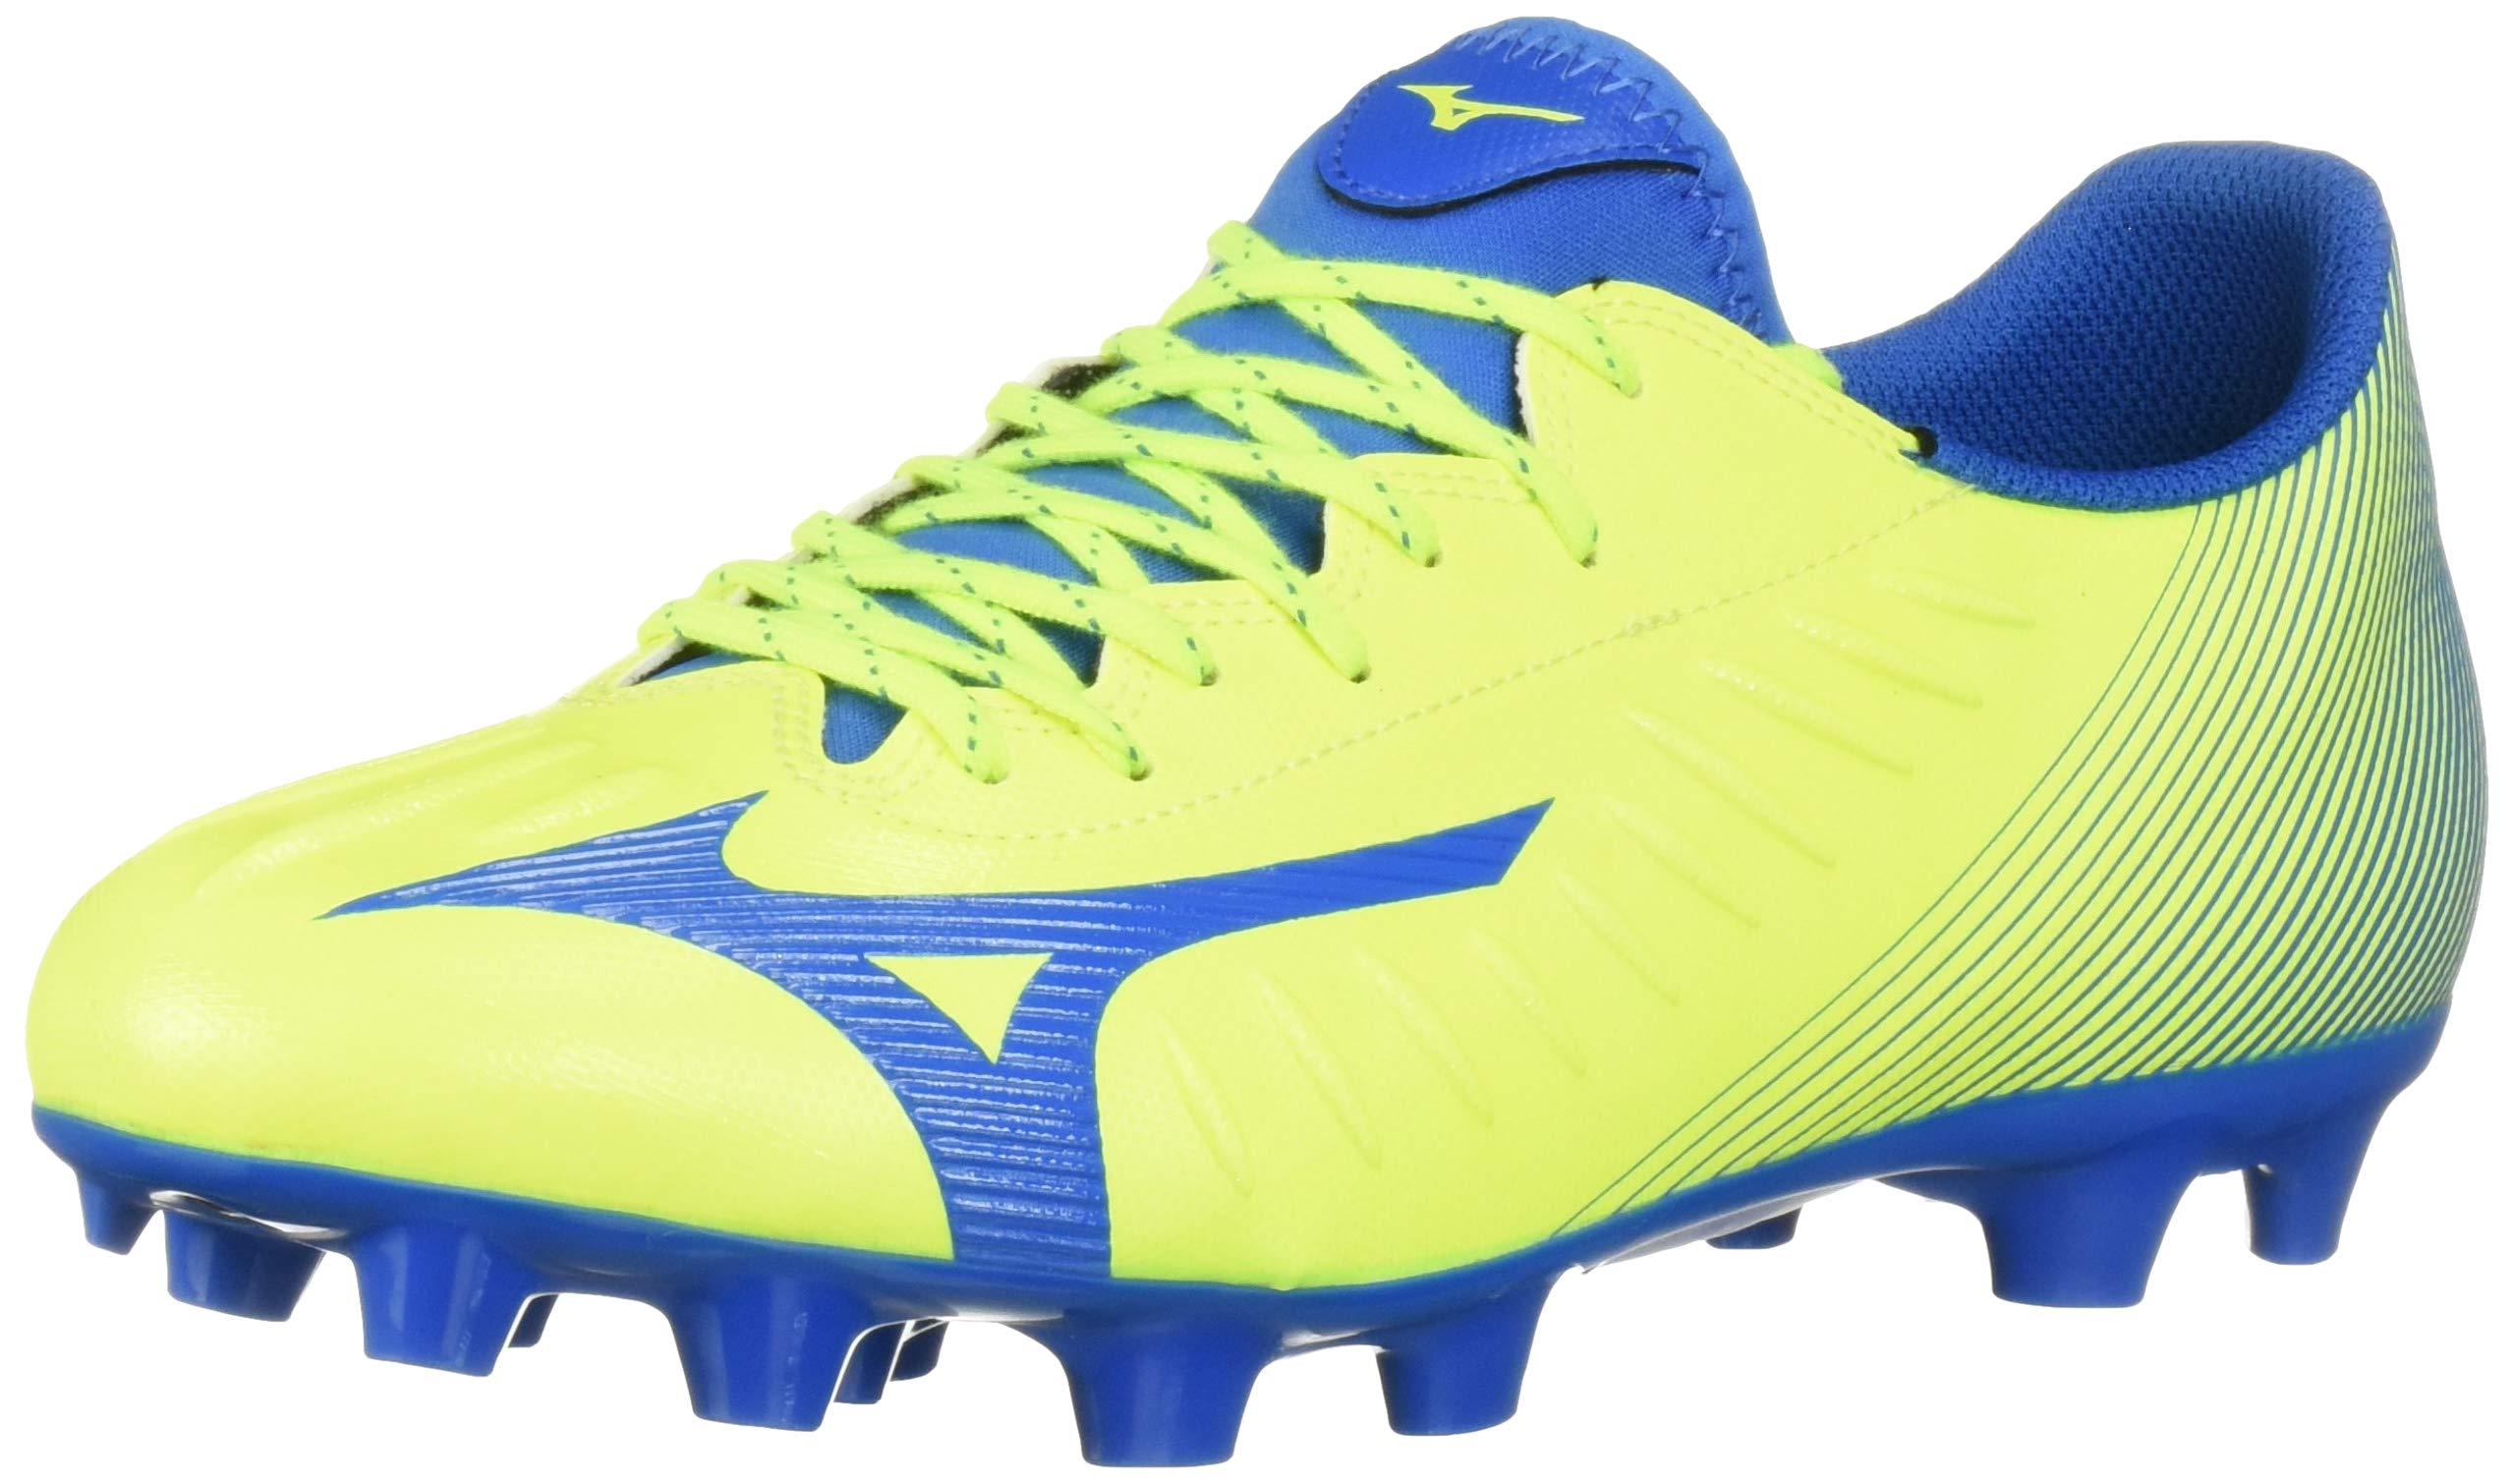 Mizuno Rebula III Select Soccer Shoe, Safety Yellow-Blue, 9 Regular US by Mizuno